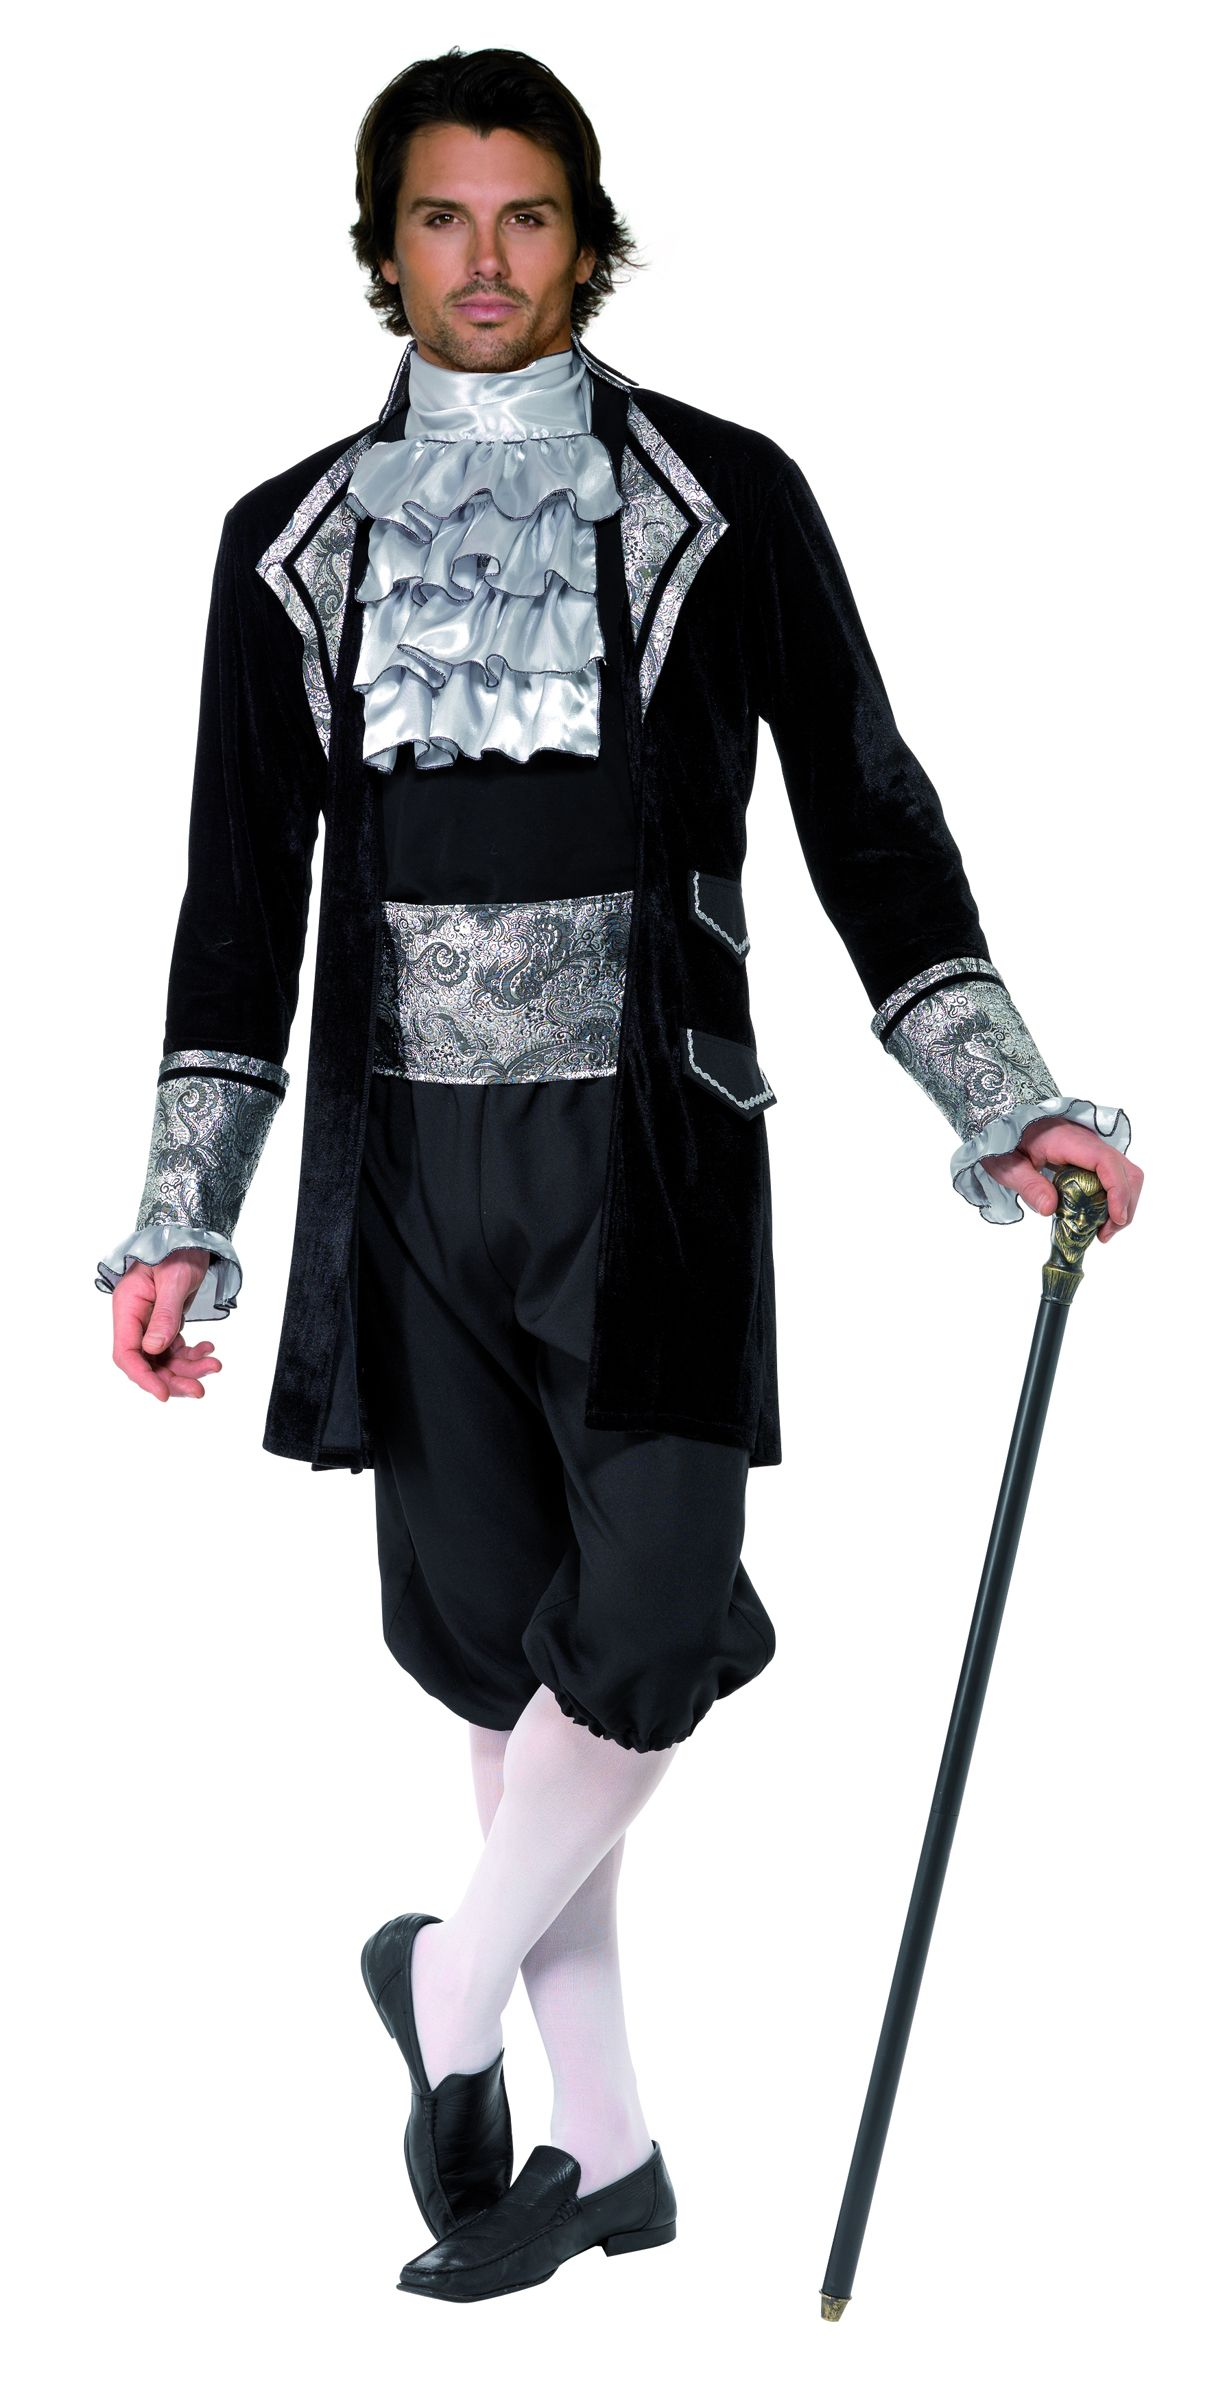 0094b5bfed07 Disfraz de vampiro para hombre ideal para Halloween | bassem ...